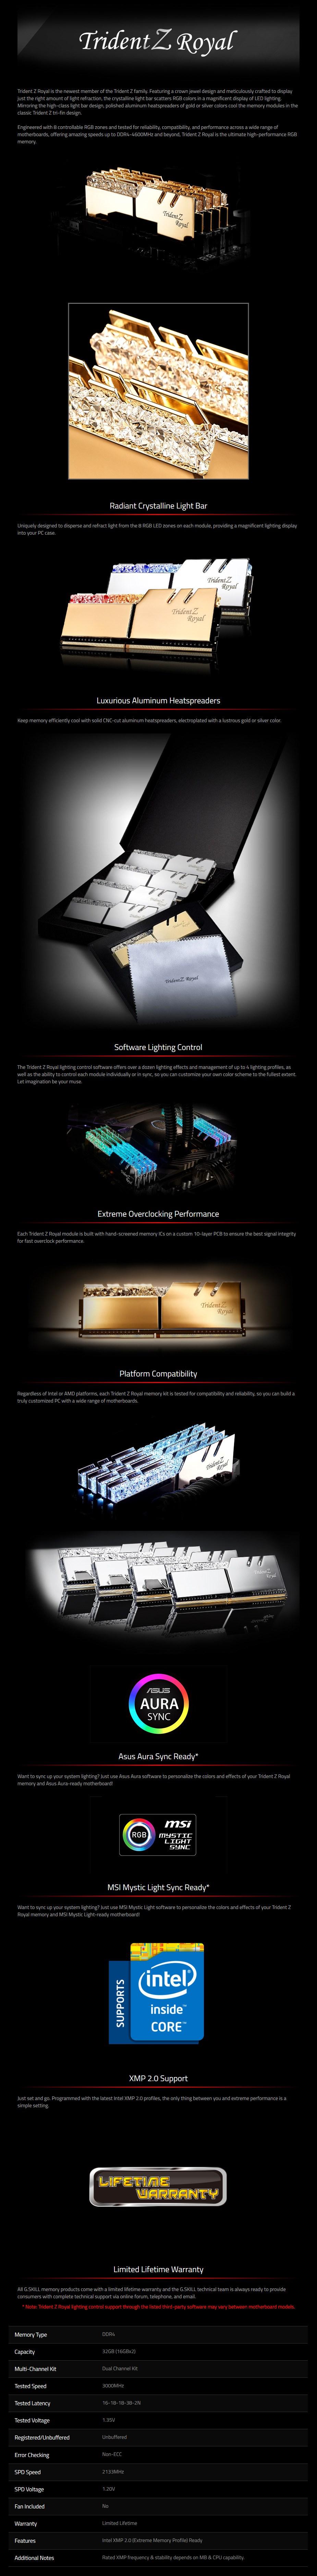 G.SKill Trident Z RGB Royal 32GB (2x 16GB) DDR4 3000MHz Memory - Silver - Desktop Overview 1